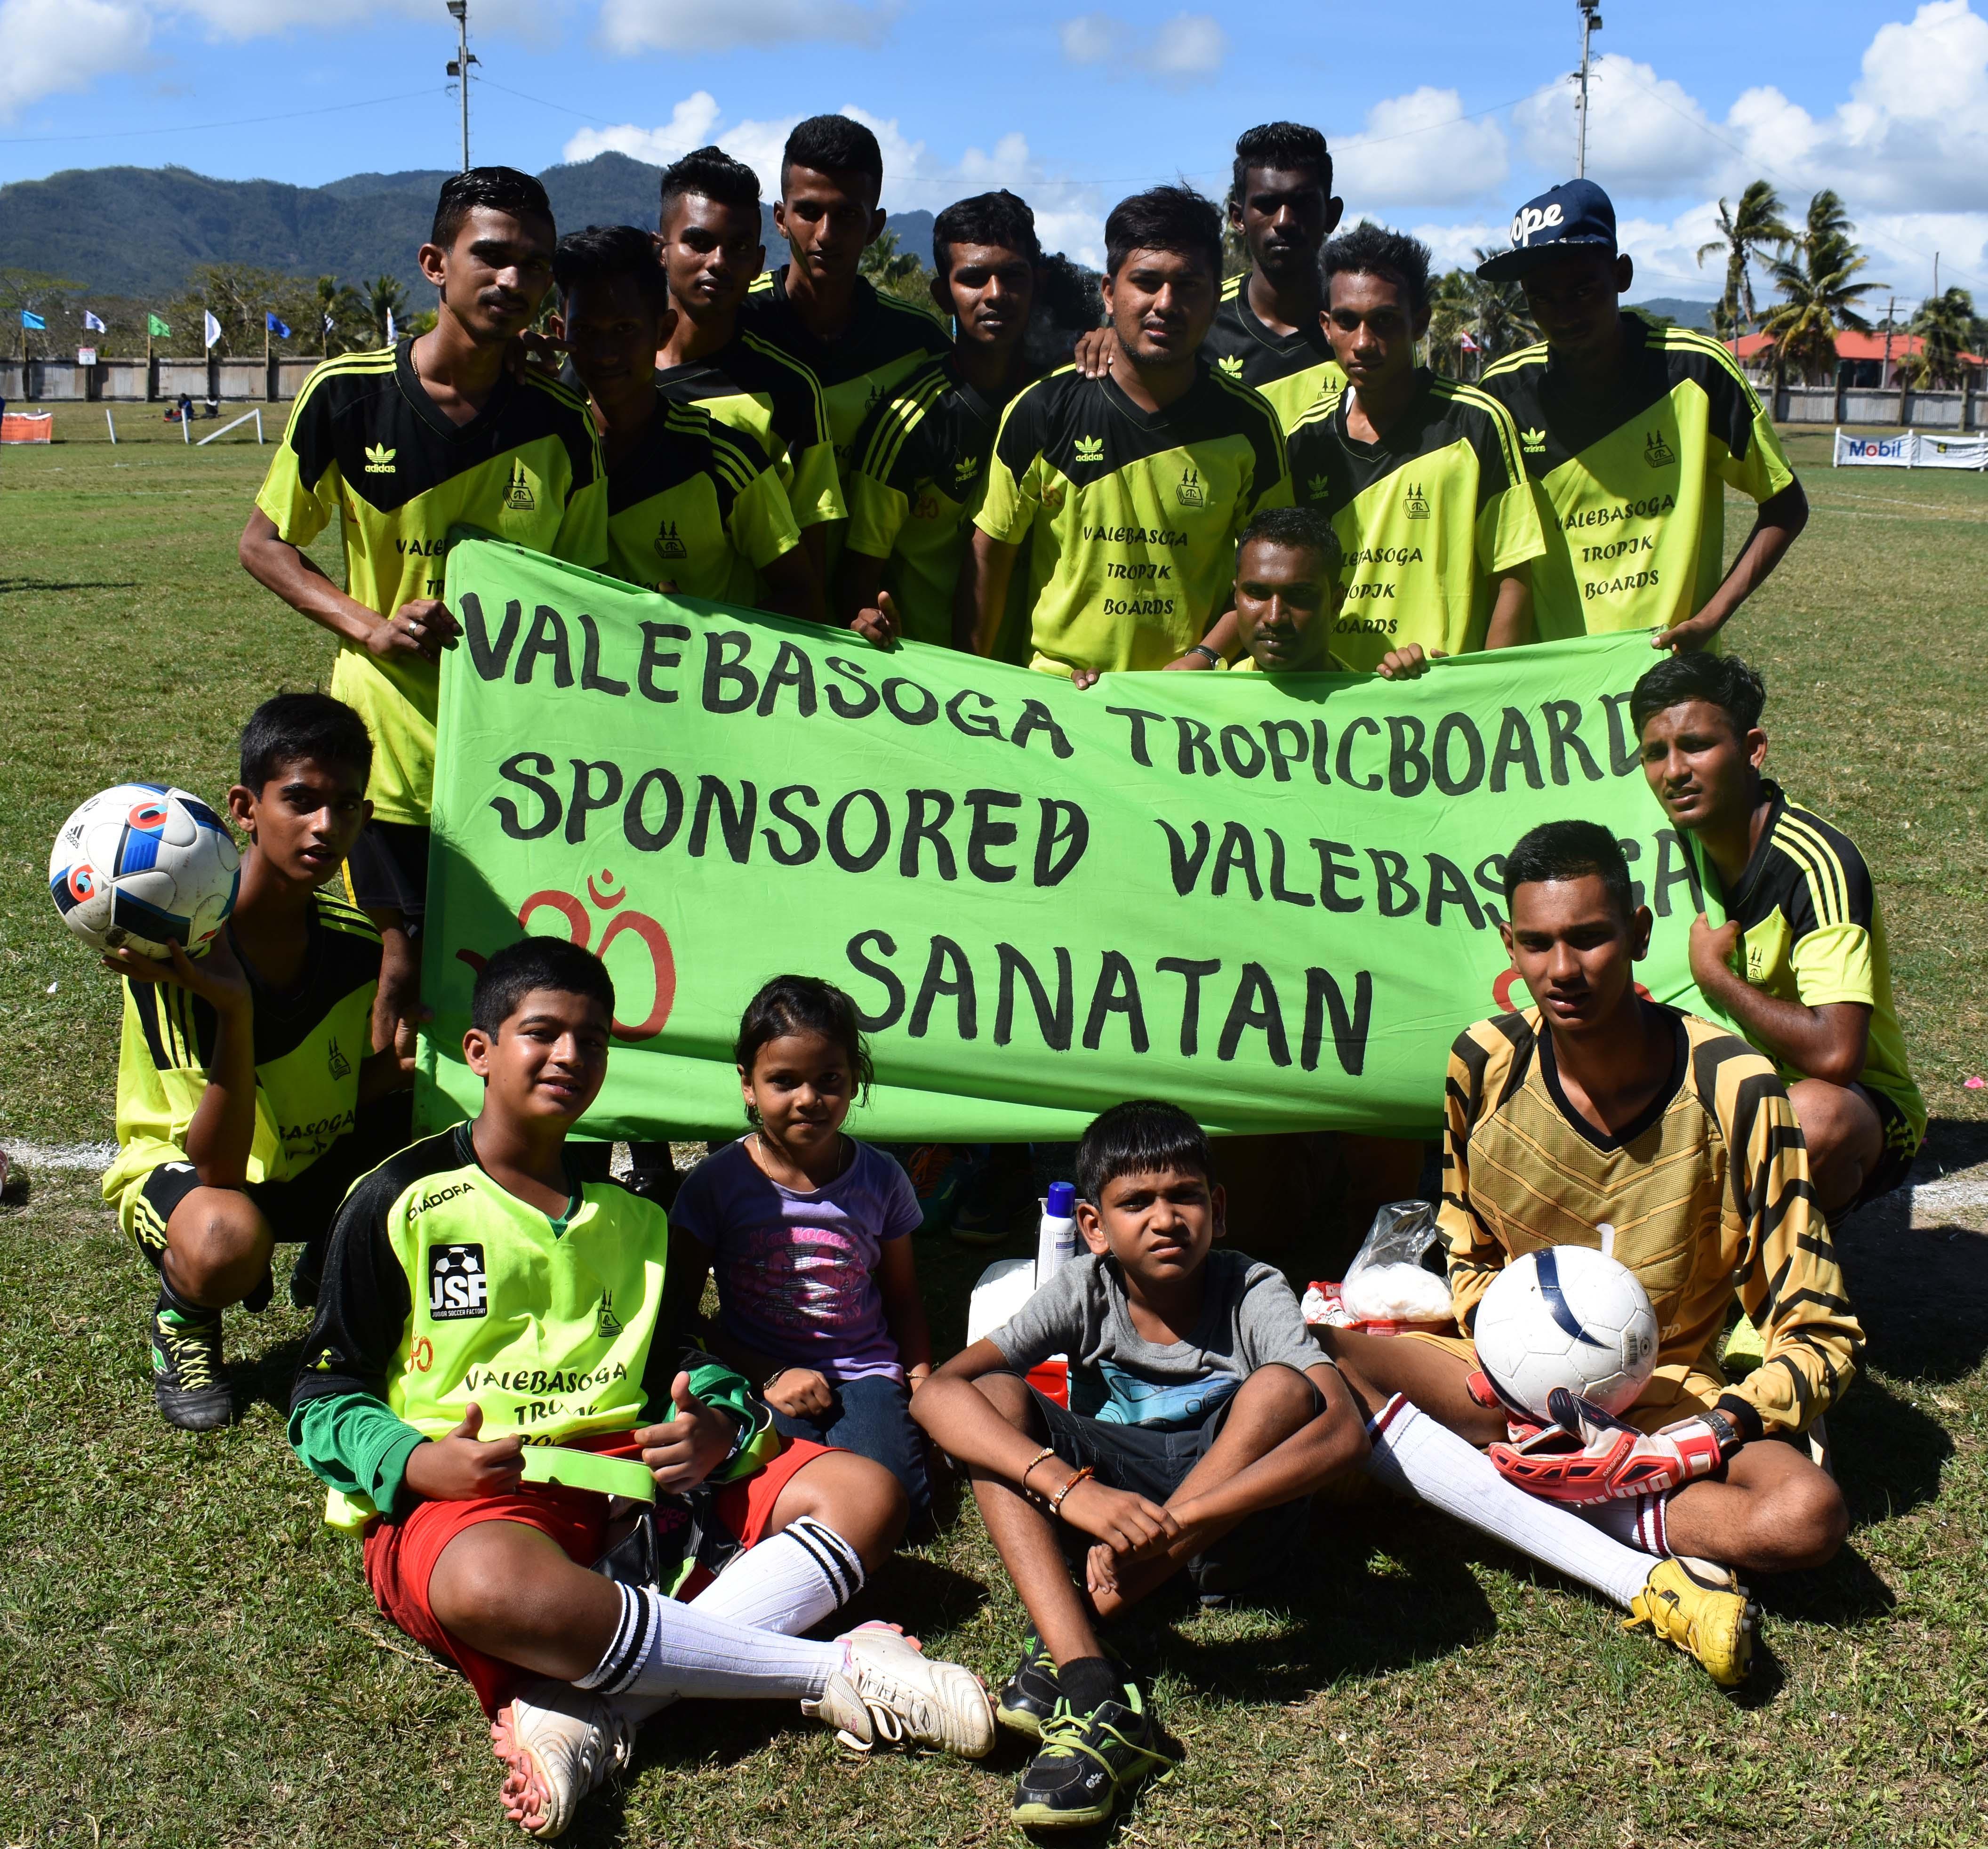 Valebasoga won the Best Dressed Team prize  during the Carpenters Finance Labasa Sanatan Tournament at Subrail Park in Labasa on September 2, 2017. Photo: Anjelene Mudaliar